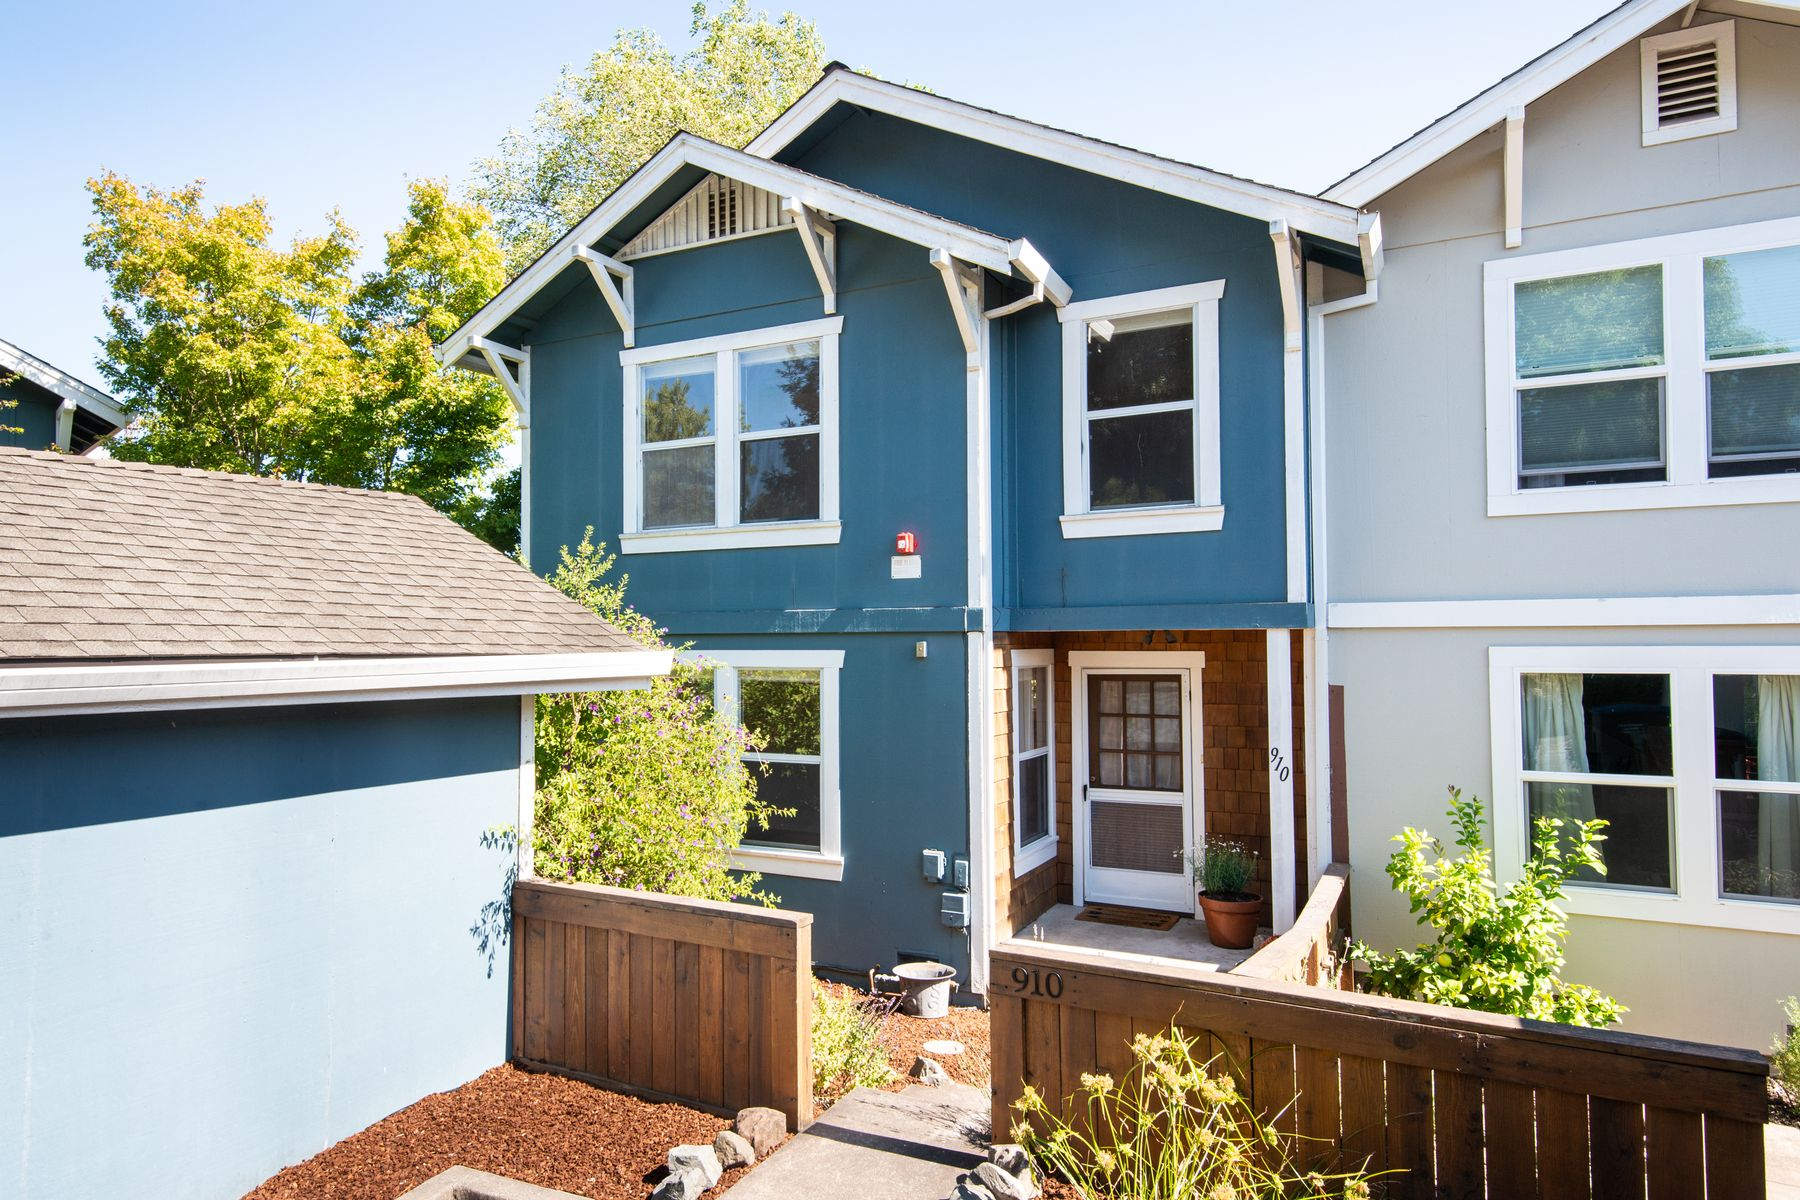 Condominiums for Sale at 910 Pepperwood Ln Petaluma, California 94952 United States